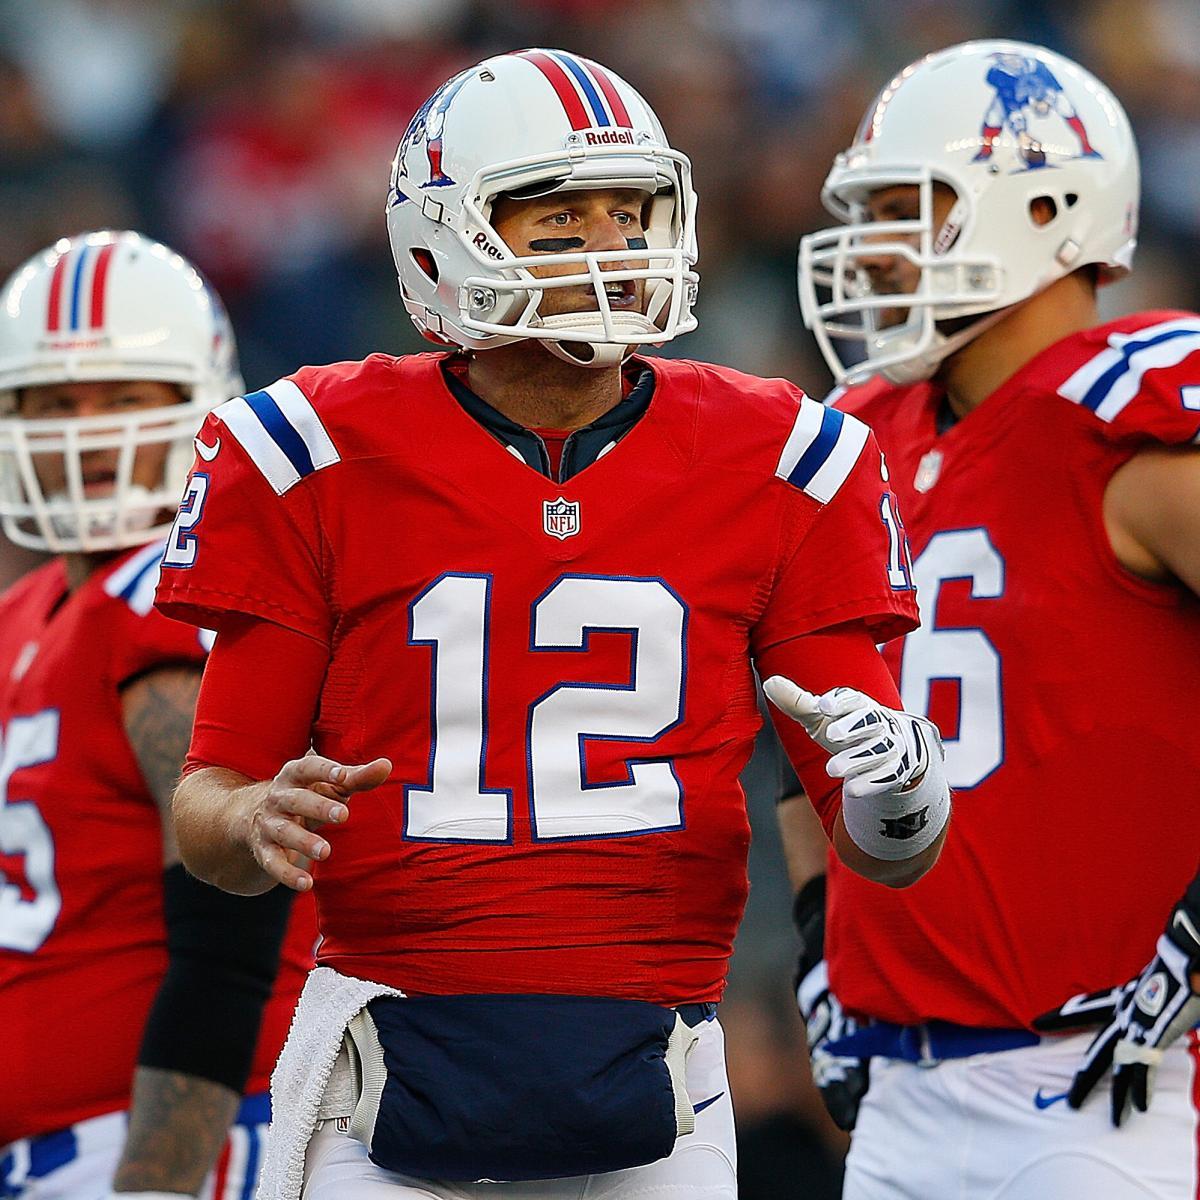 sale retailer 851e7 62d86 Pat Patriot, R.I.P.? New NFL Safety Rule Forbids Alternate ...